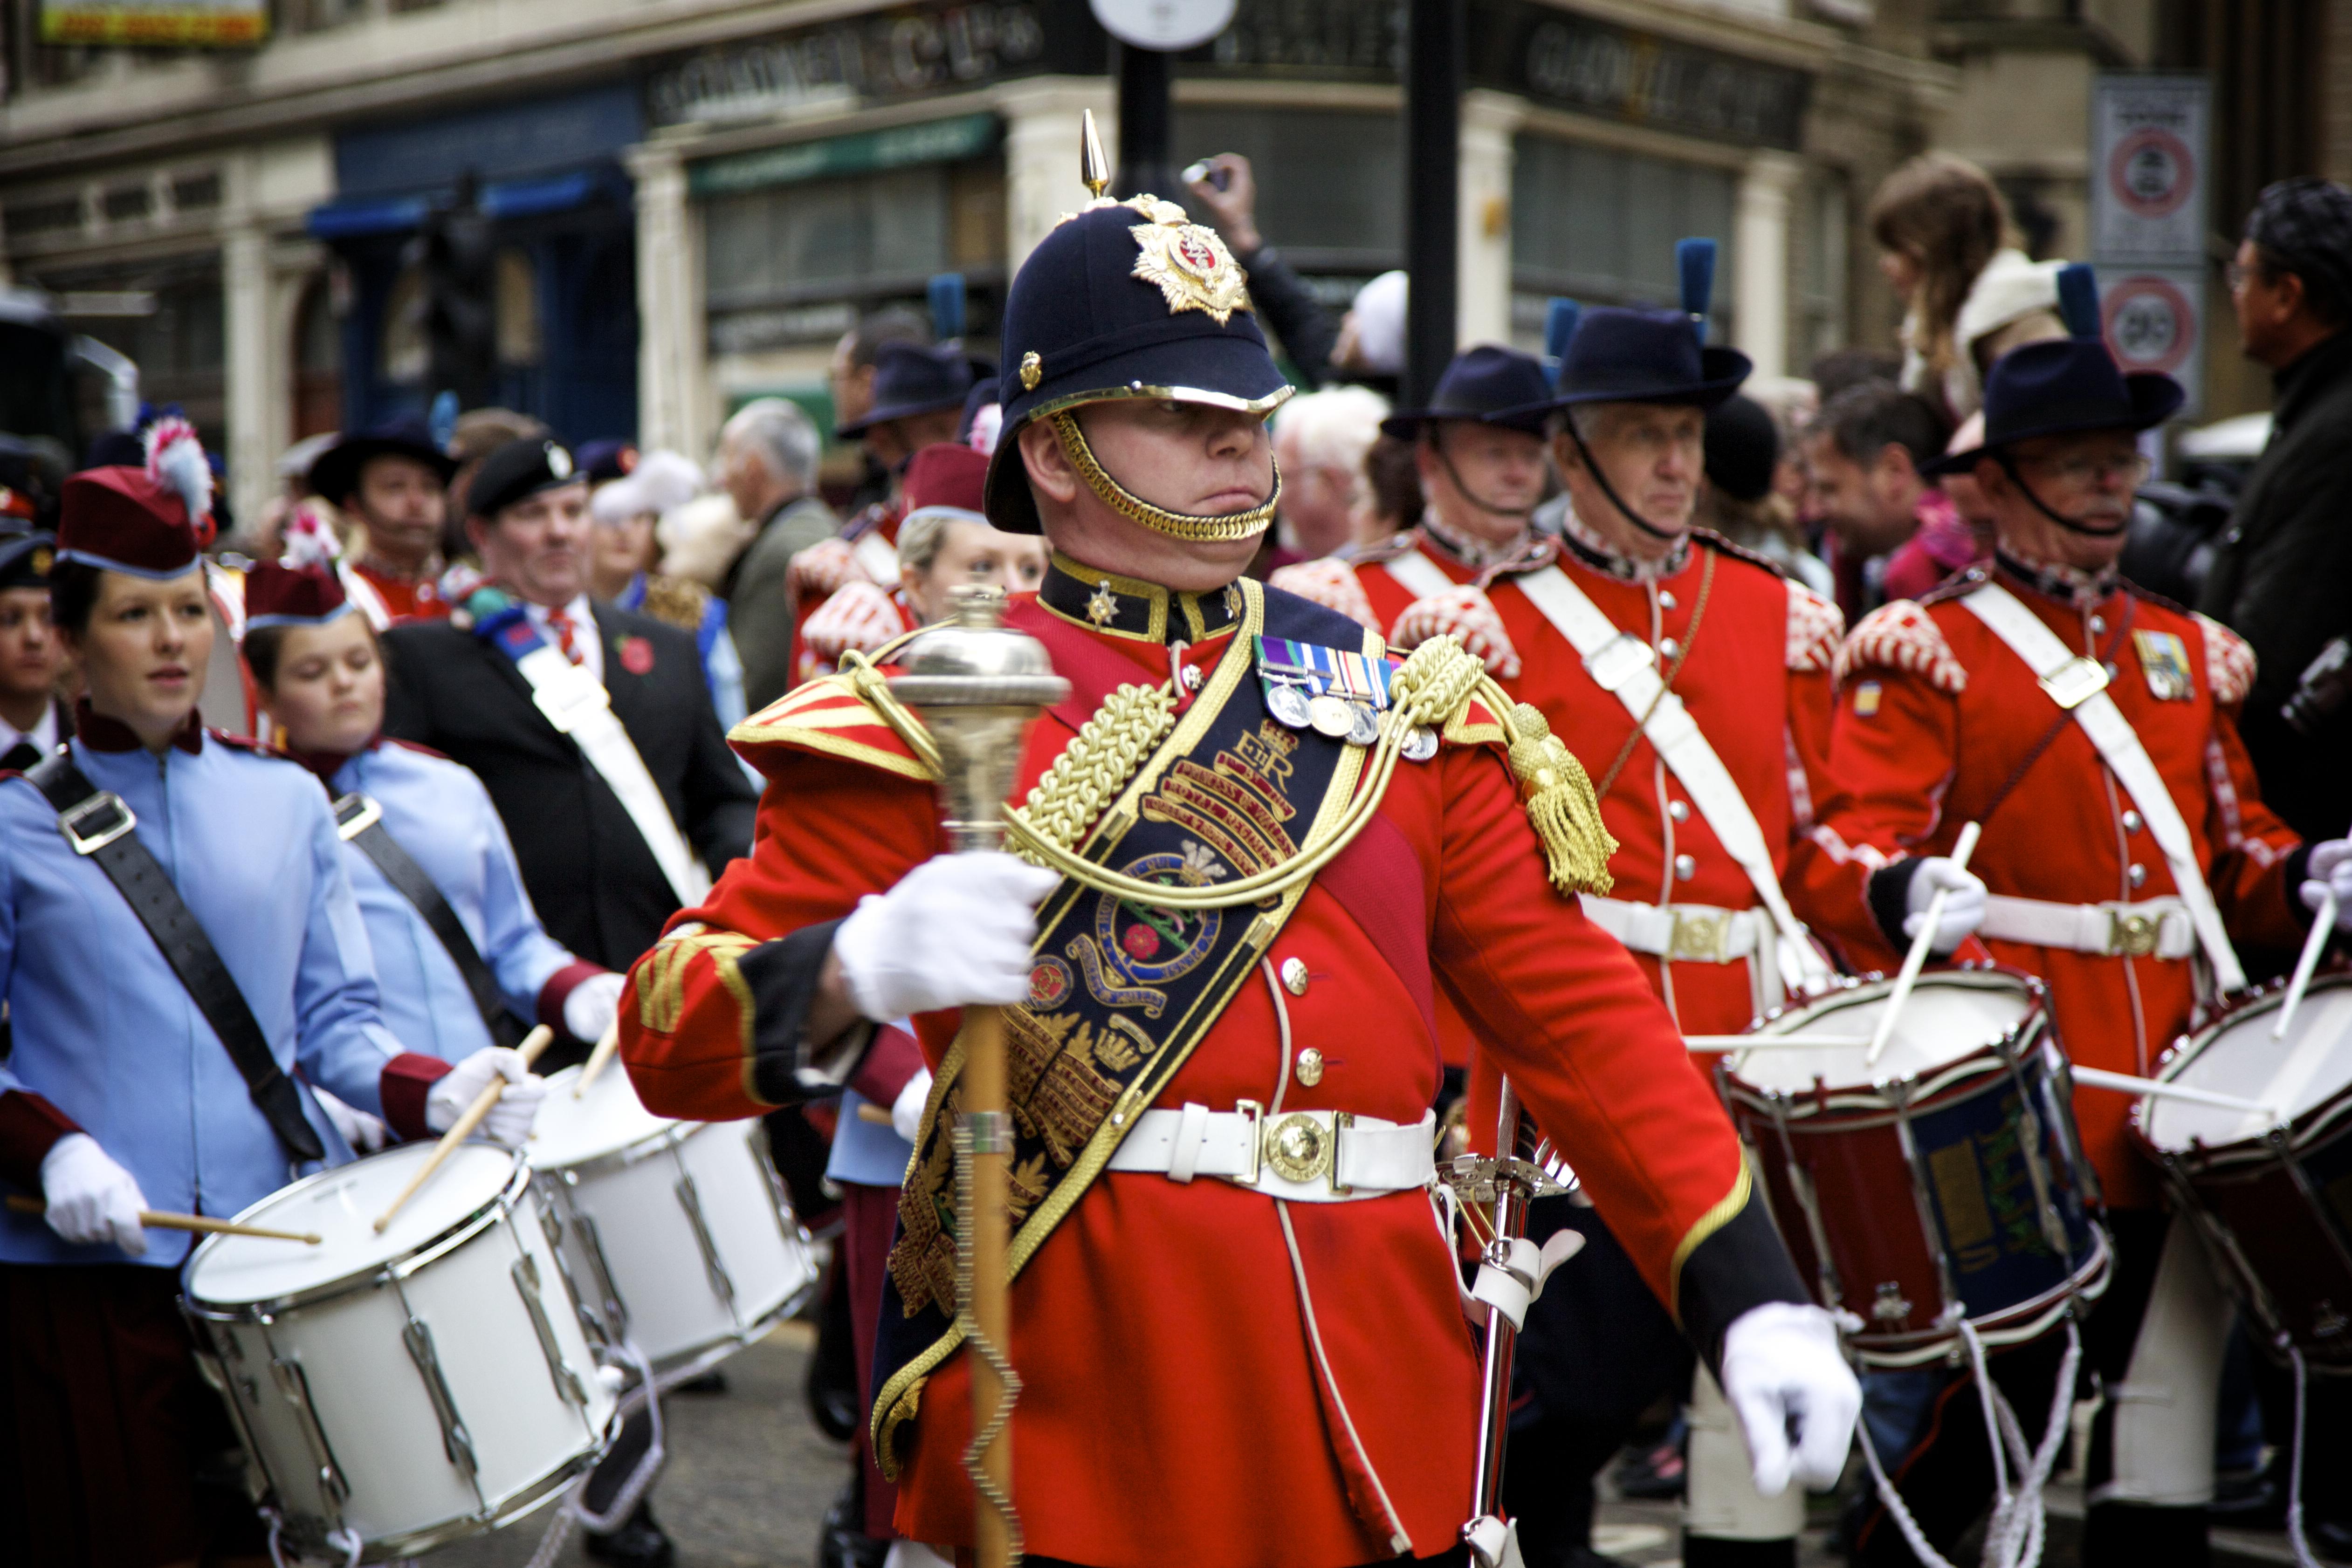 File:Lord Mayor's Show 2010 marching band.jpg - Wikimedia ...